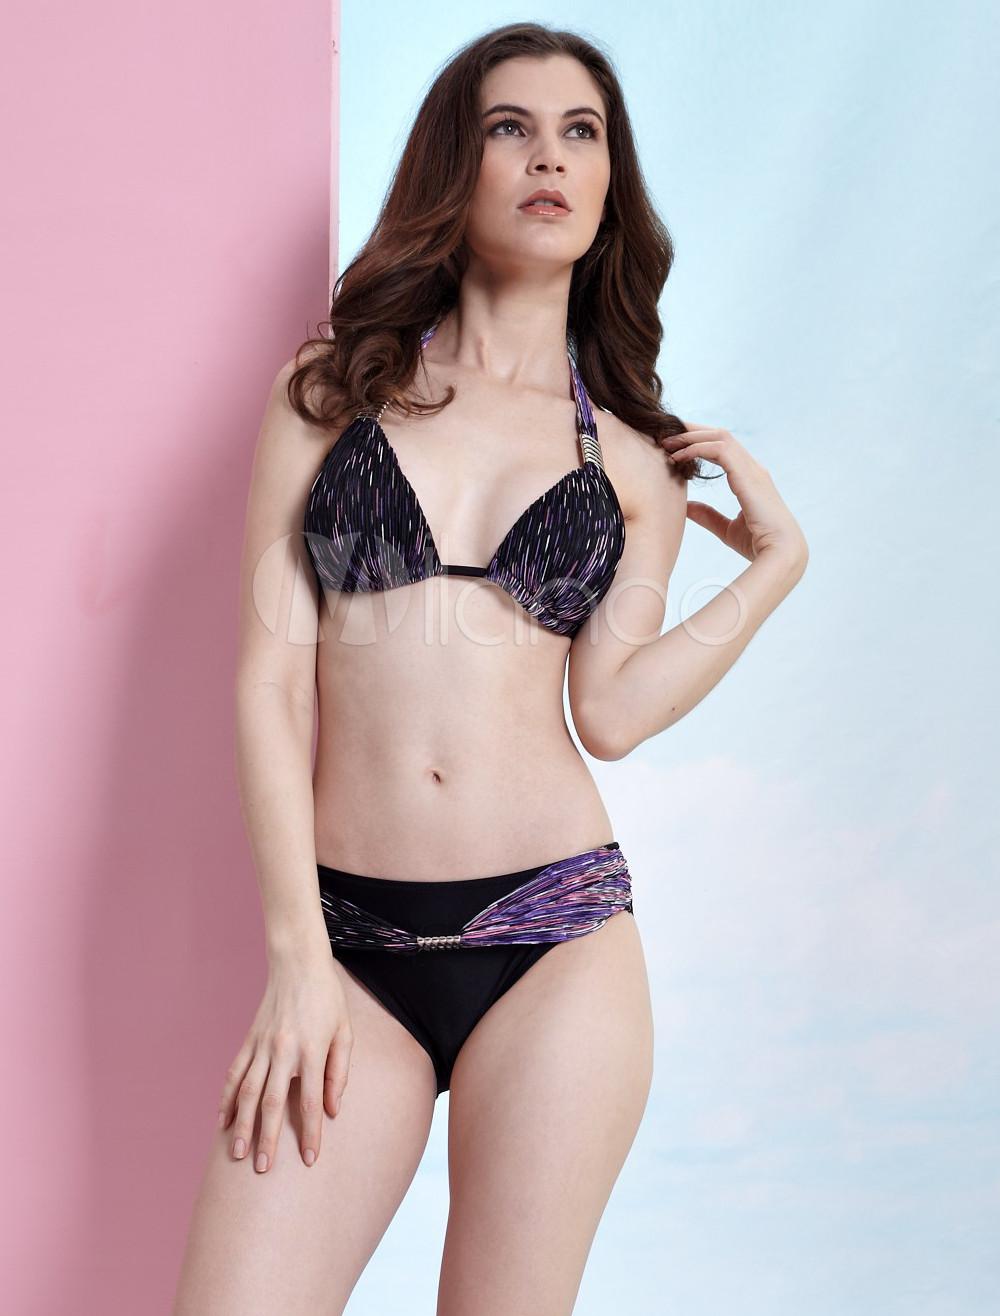 Sexy Black And Purple 80% Nylon 20% Lycra Womens Bikini Swimsuit